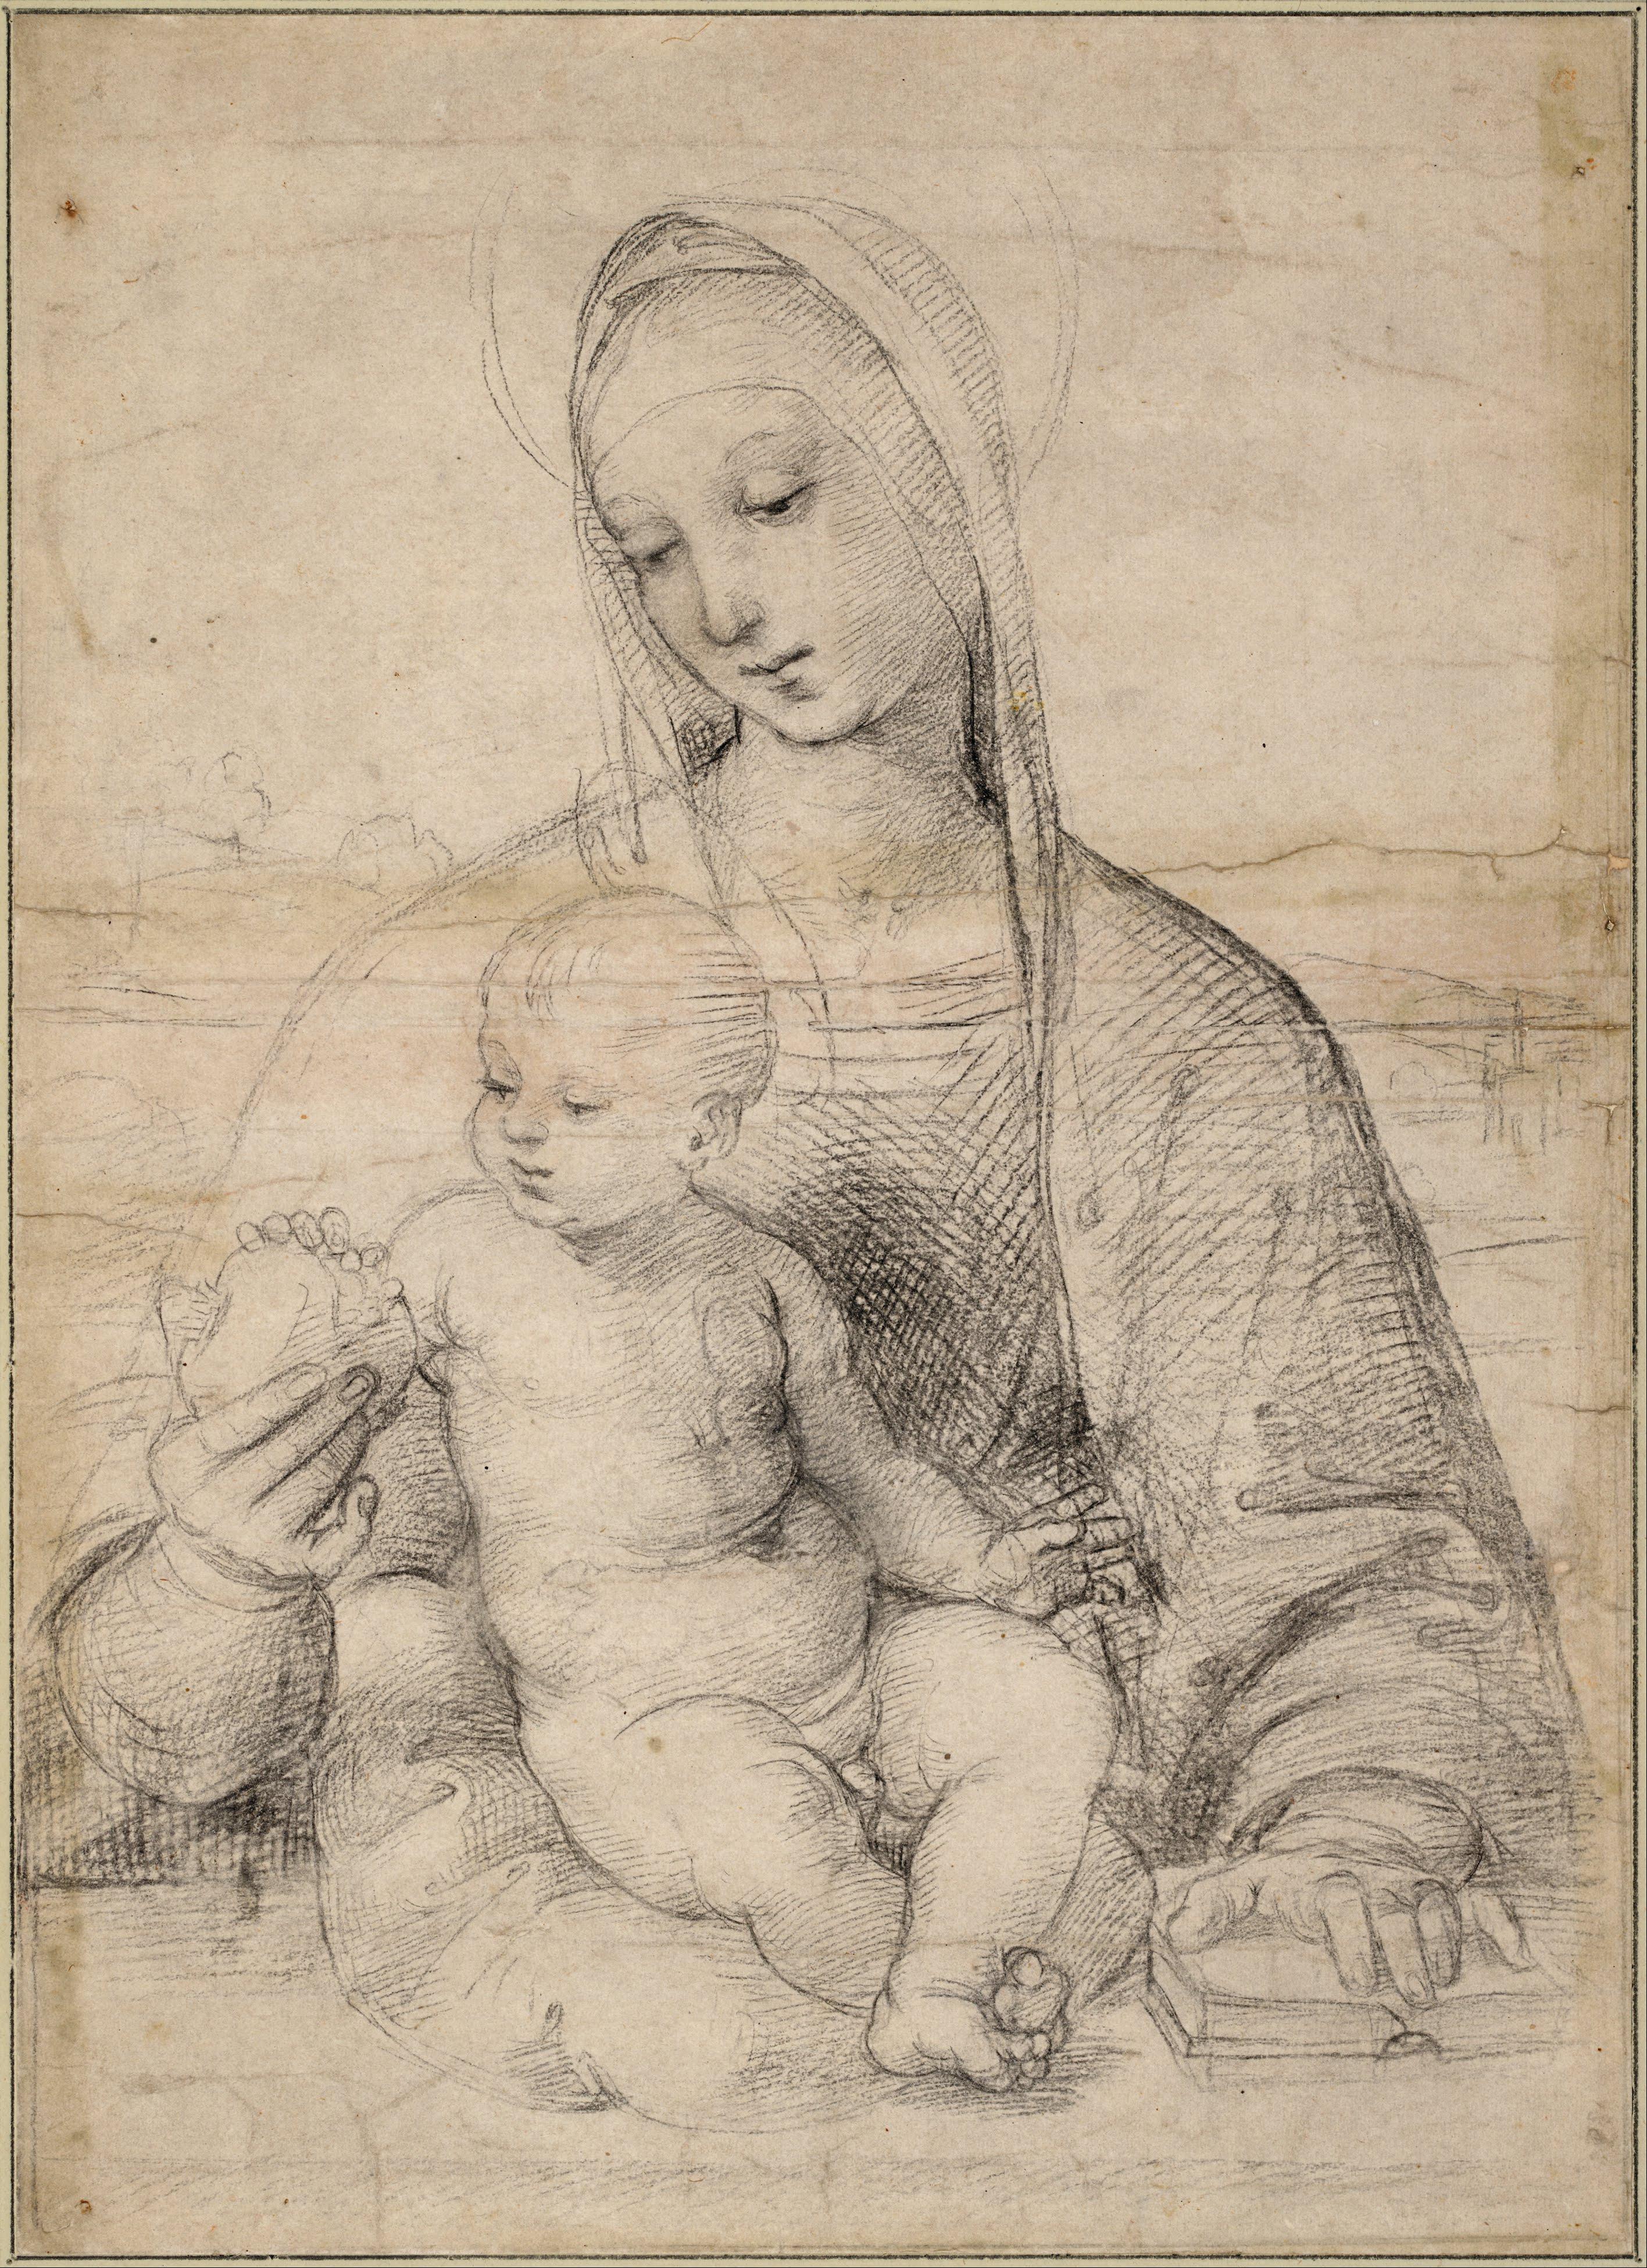 Рафаэль Санти. Мадонна с гранатом, ок. 1504 / галерея Альбертина, Вена